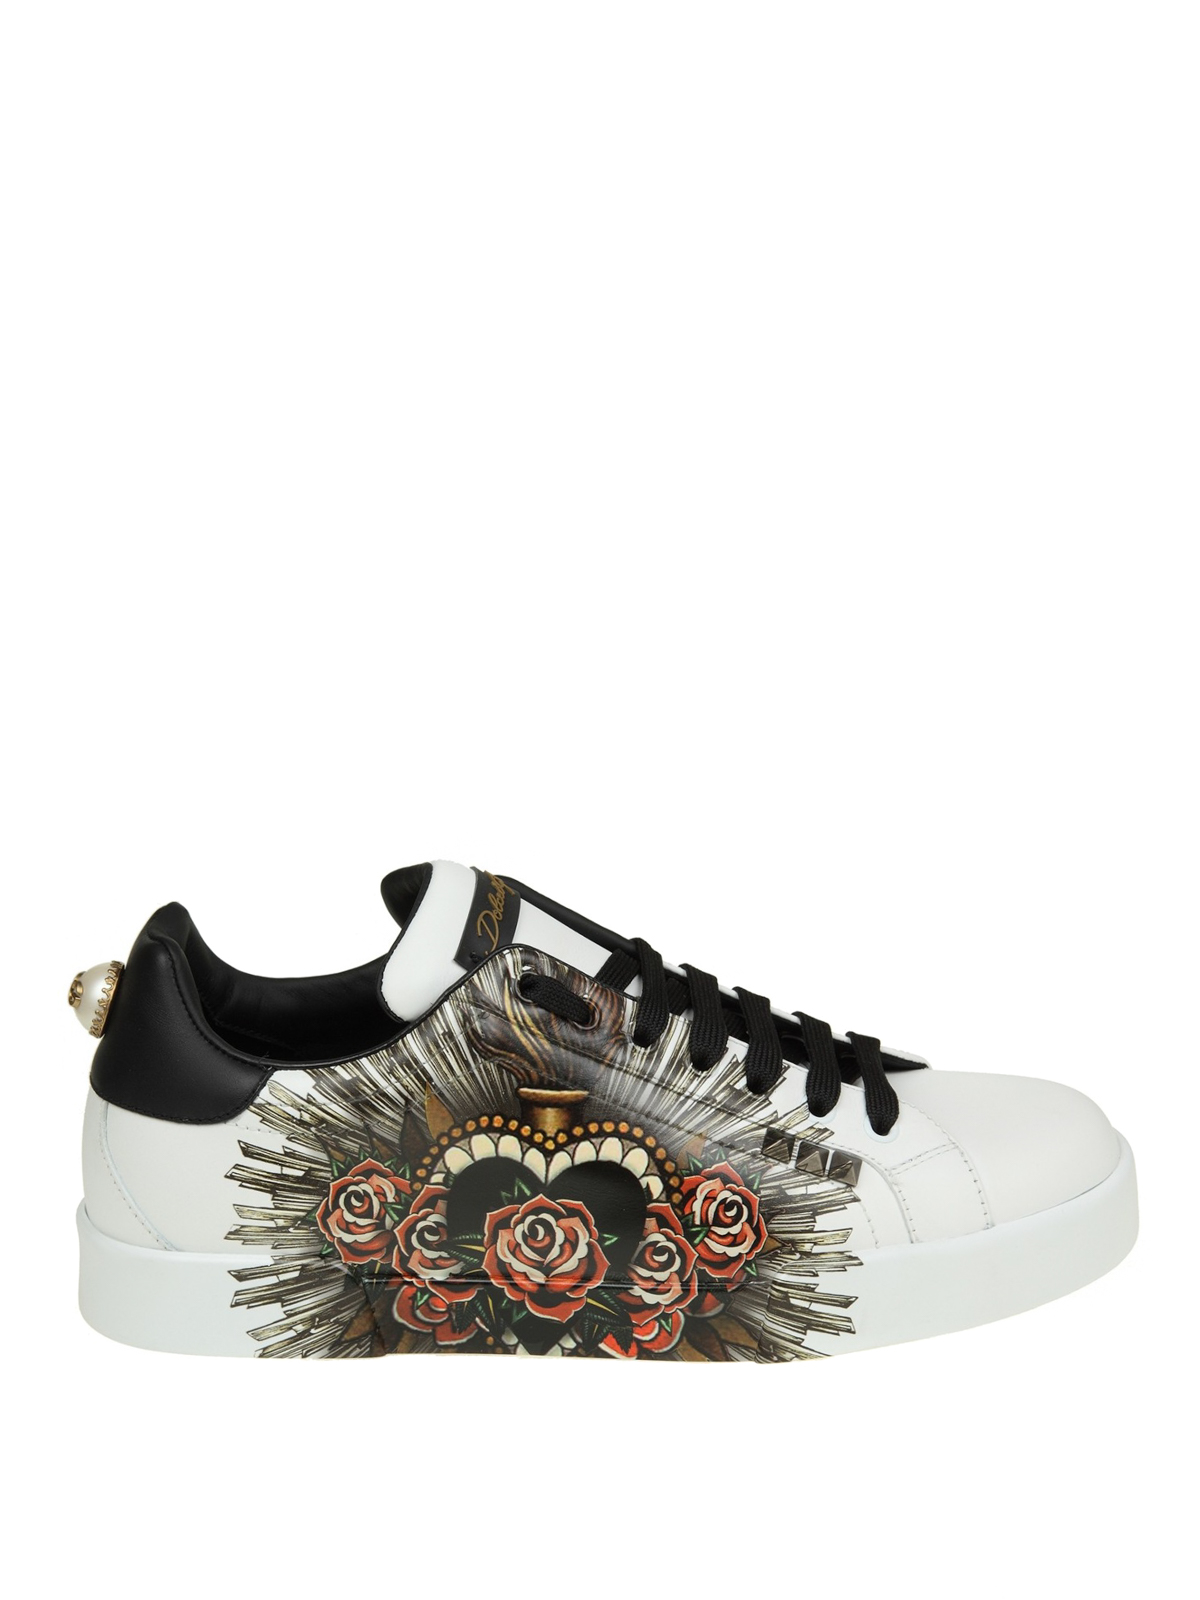 5cc3192675ca Dolce   Gabbana - Portofino printed leather sneakers - trainers ...